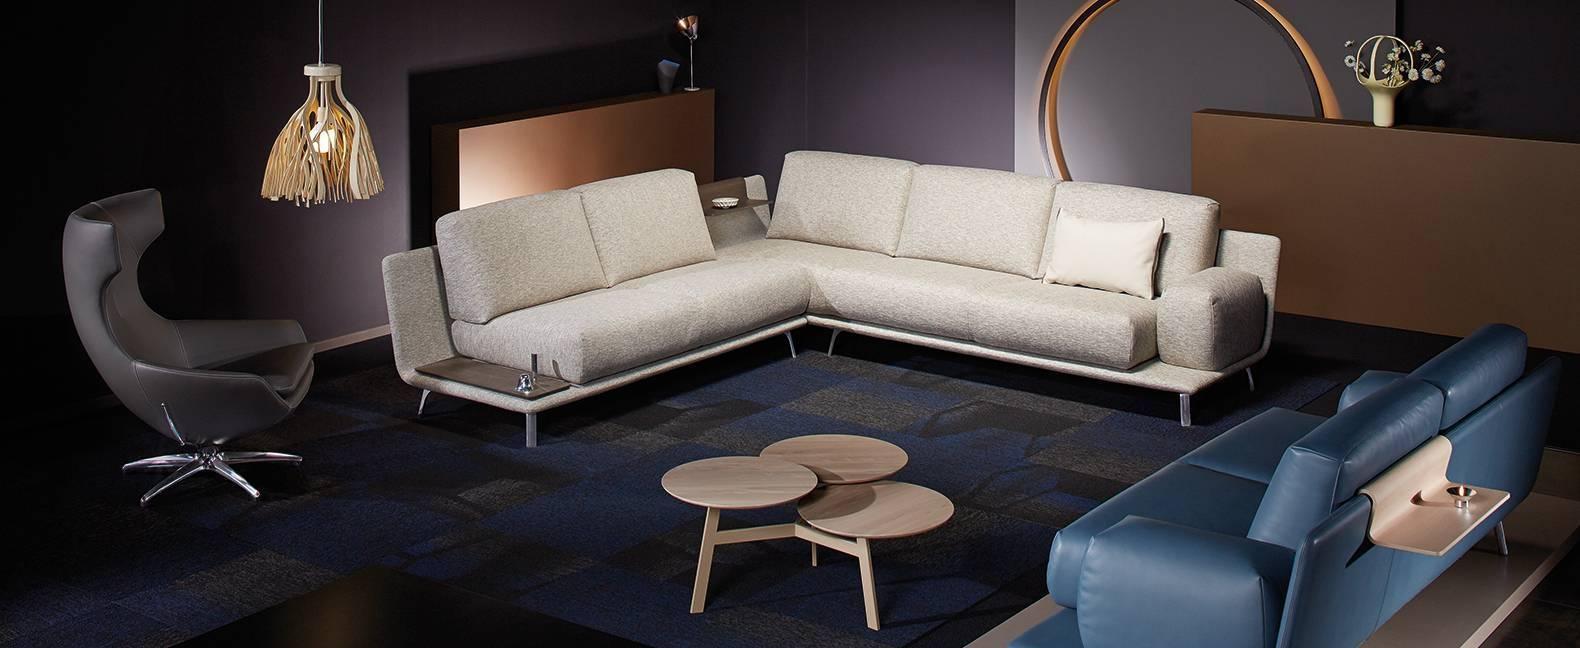 paleta-leolux-design-hoekbank